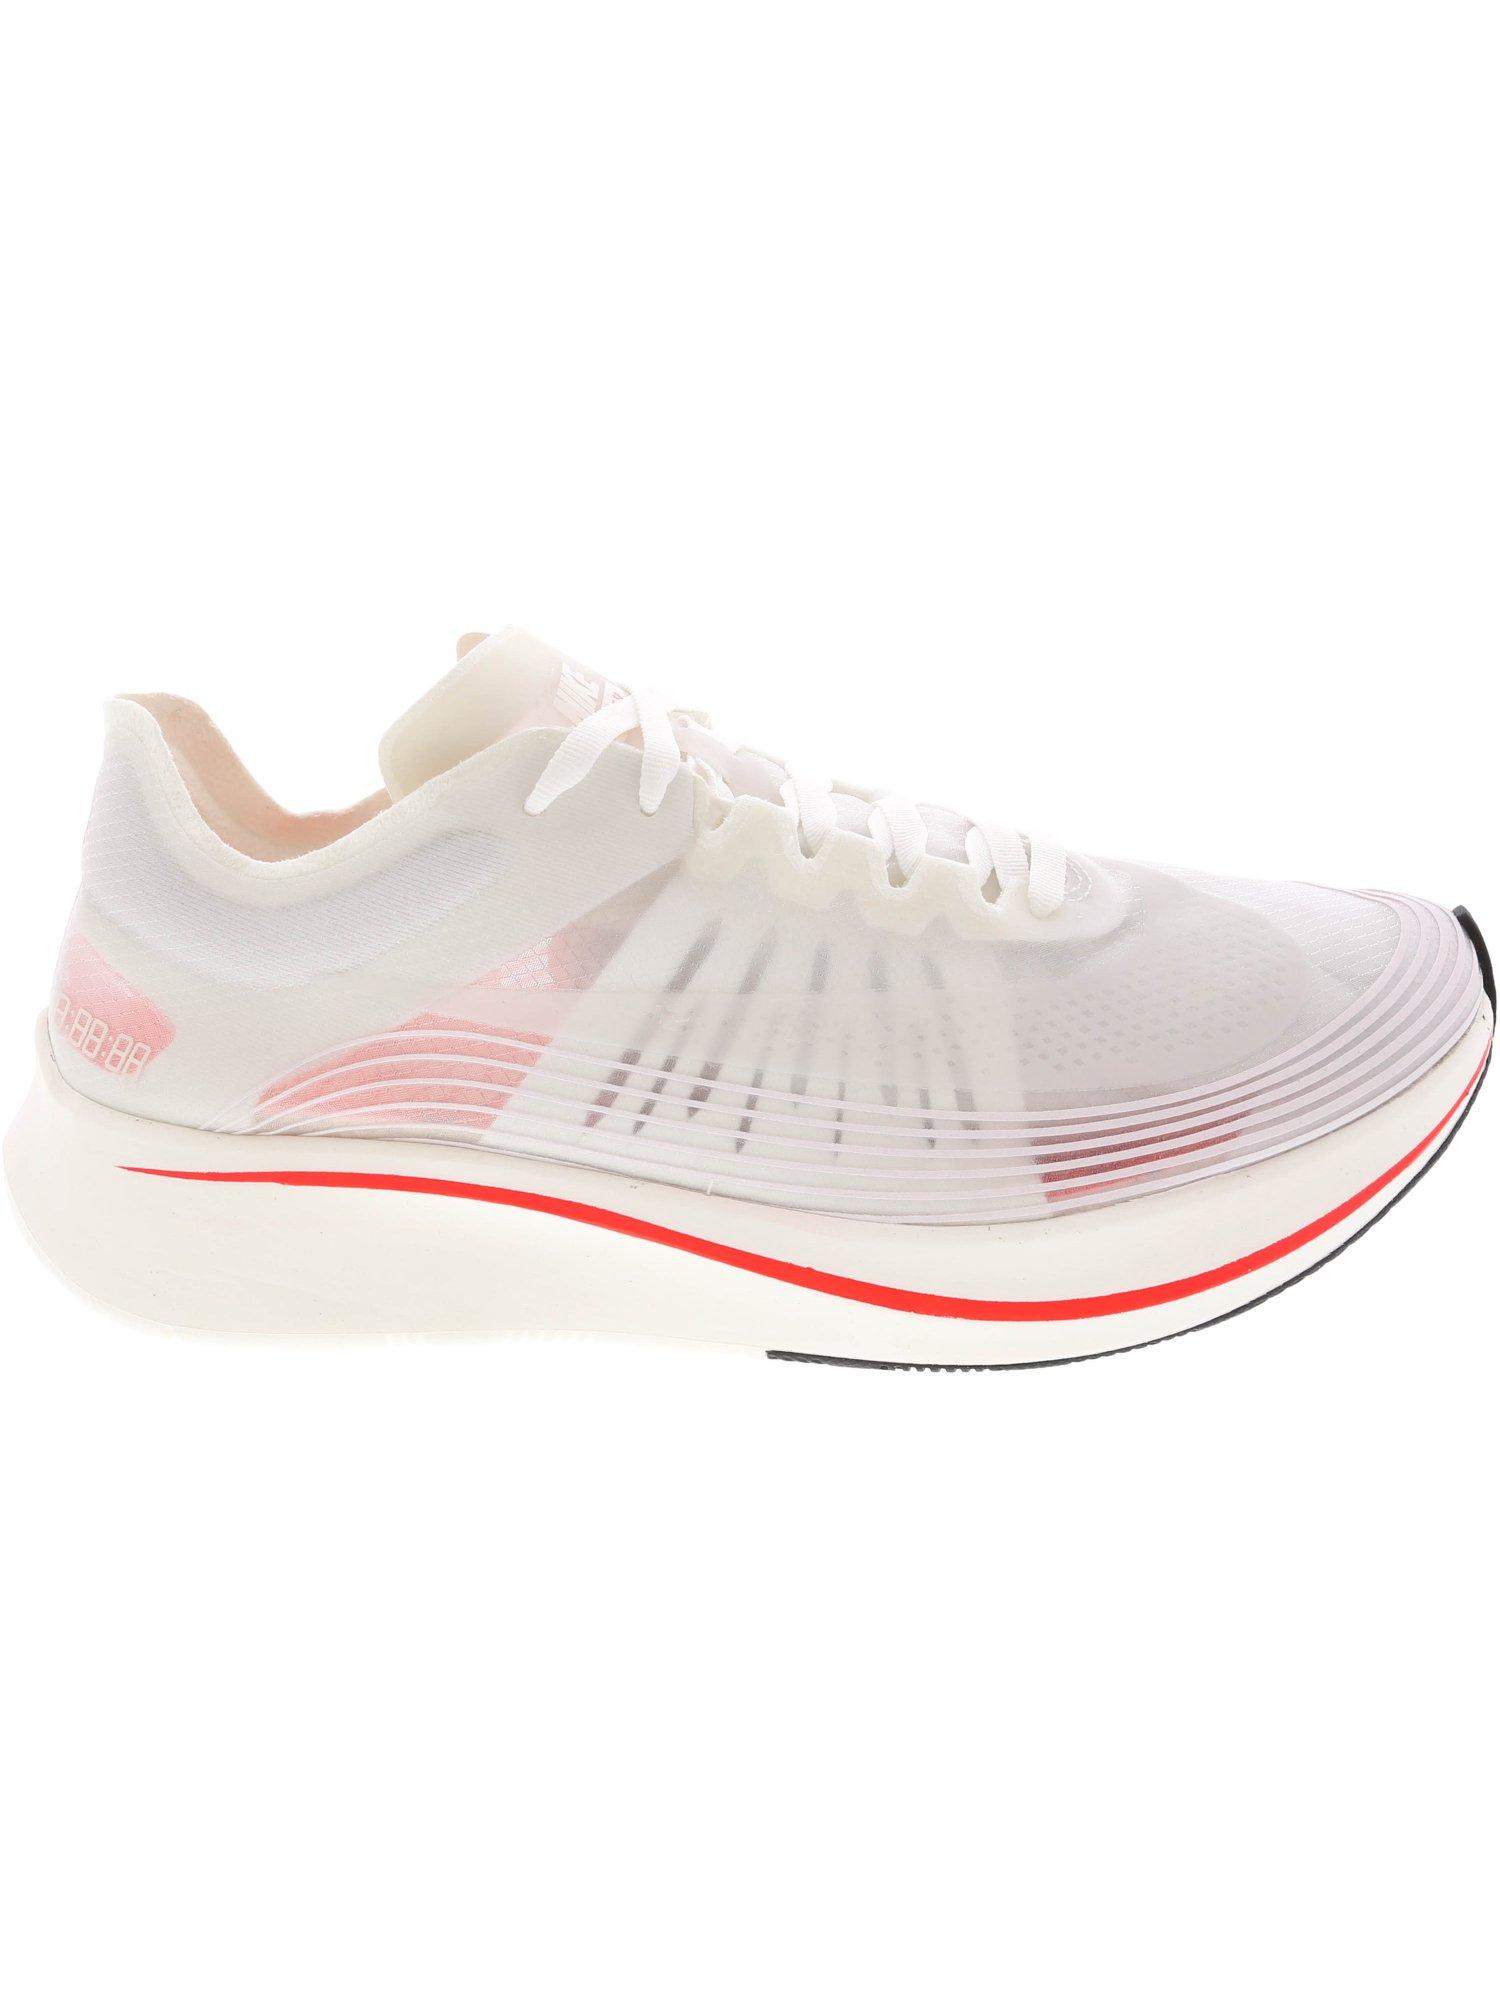 02db71fd1b0d8 Nike Zoom Fly SP Size 11 Mens Breaking 2 Crimson White Sail Aj9282 ...